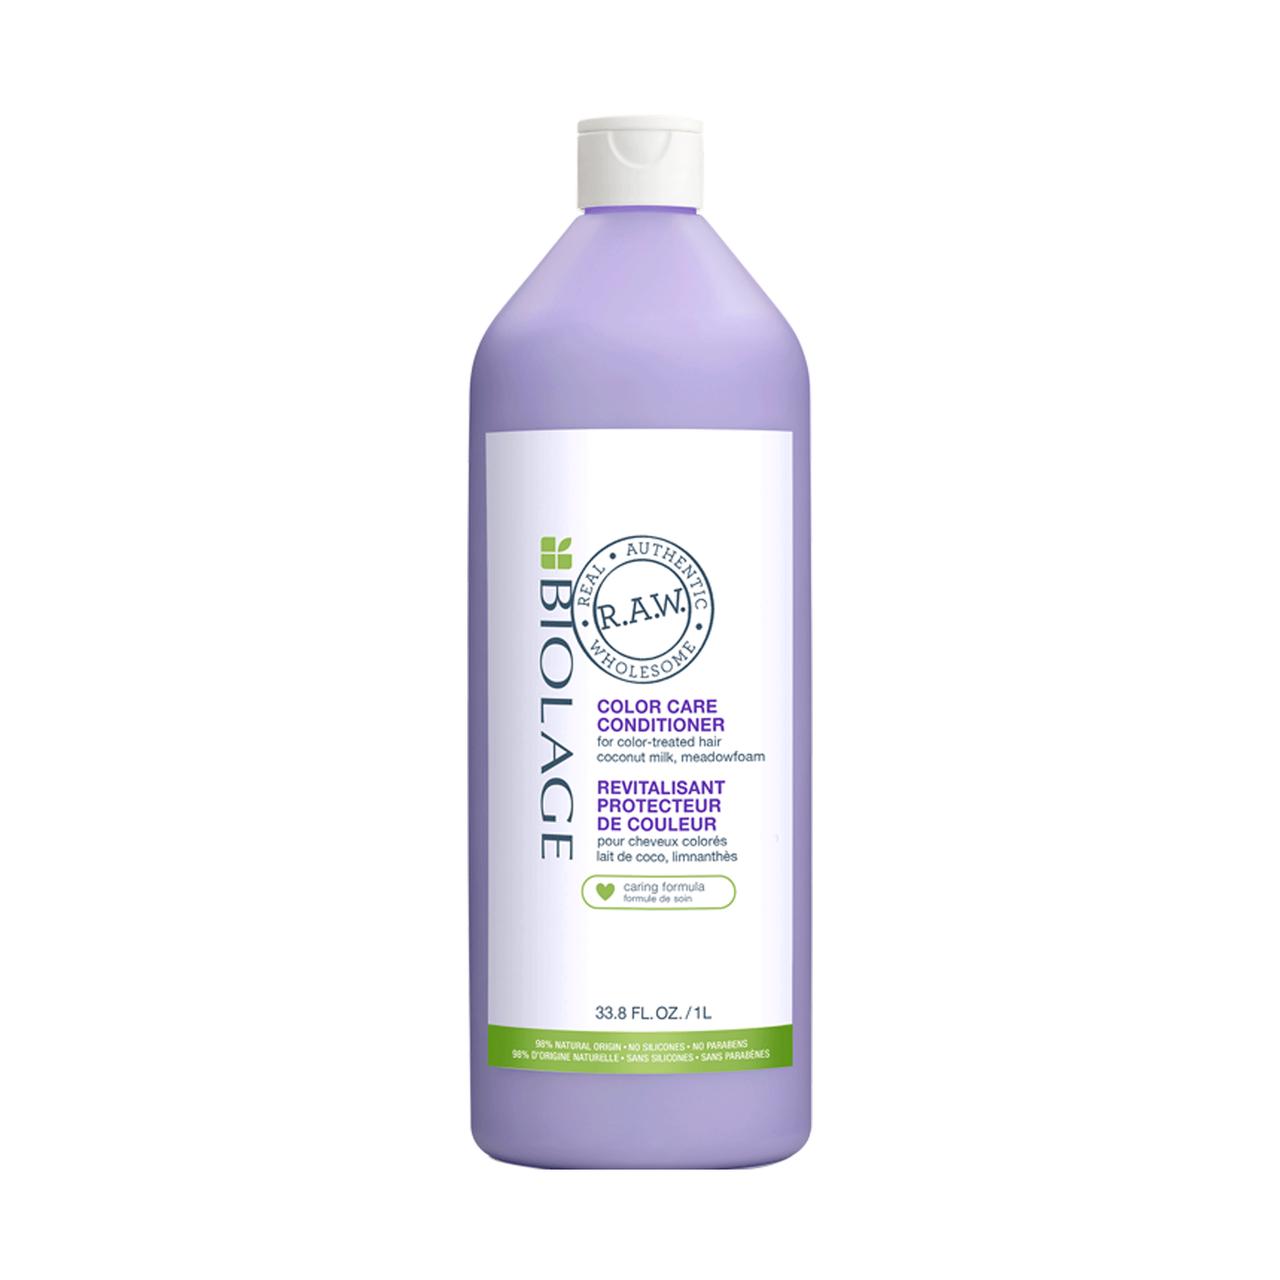 Biolage RAW Color Care Conditioner 1L